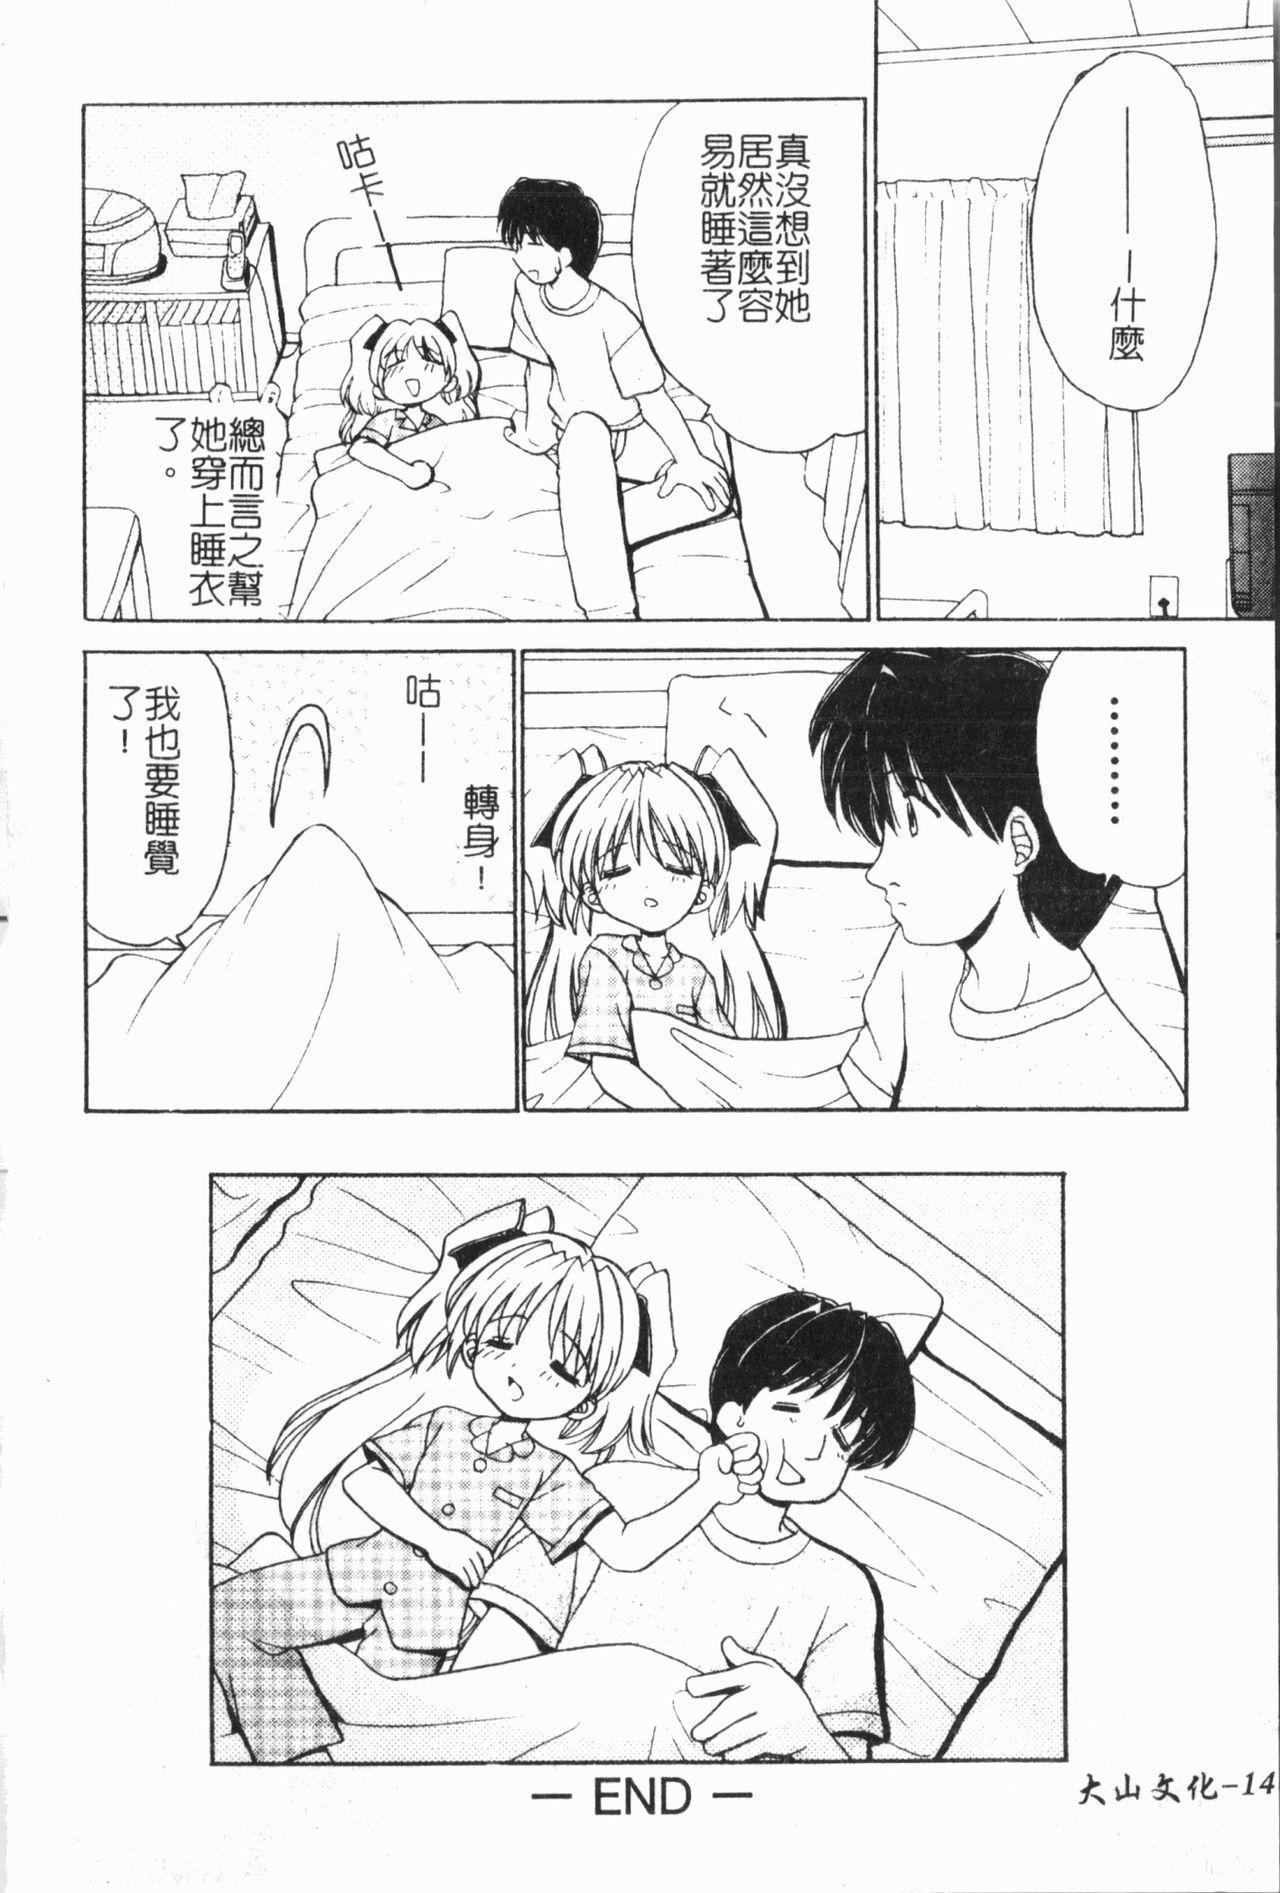 Imouto Koishi 6 146